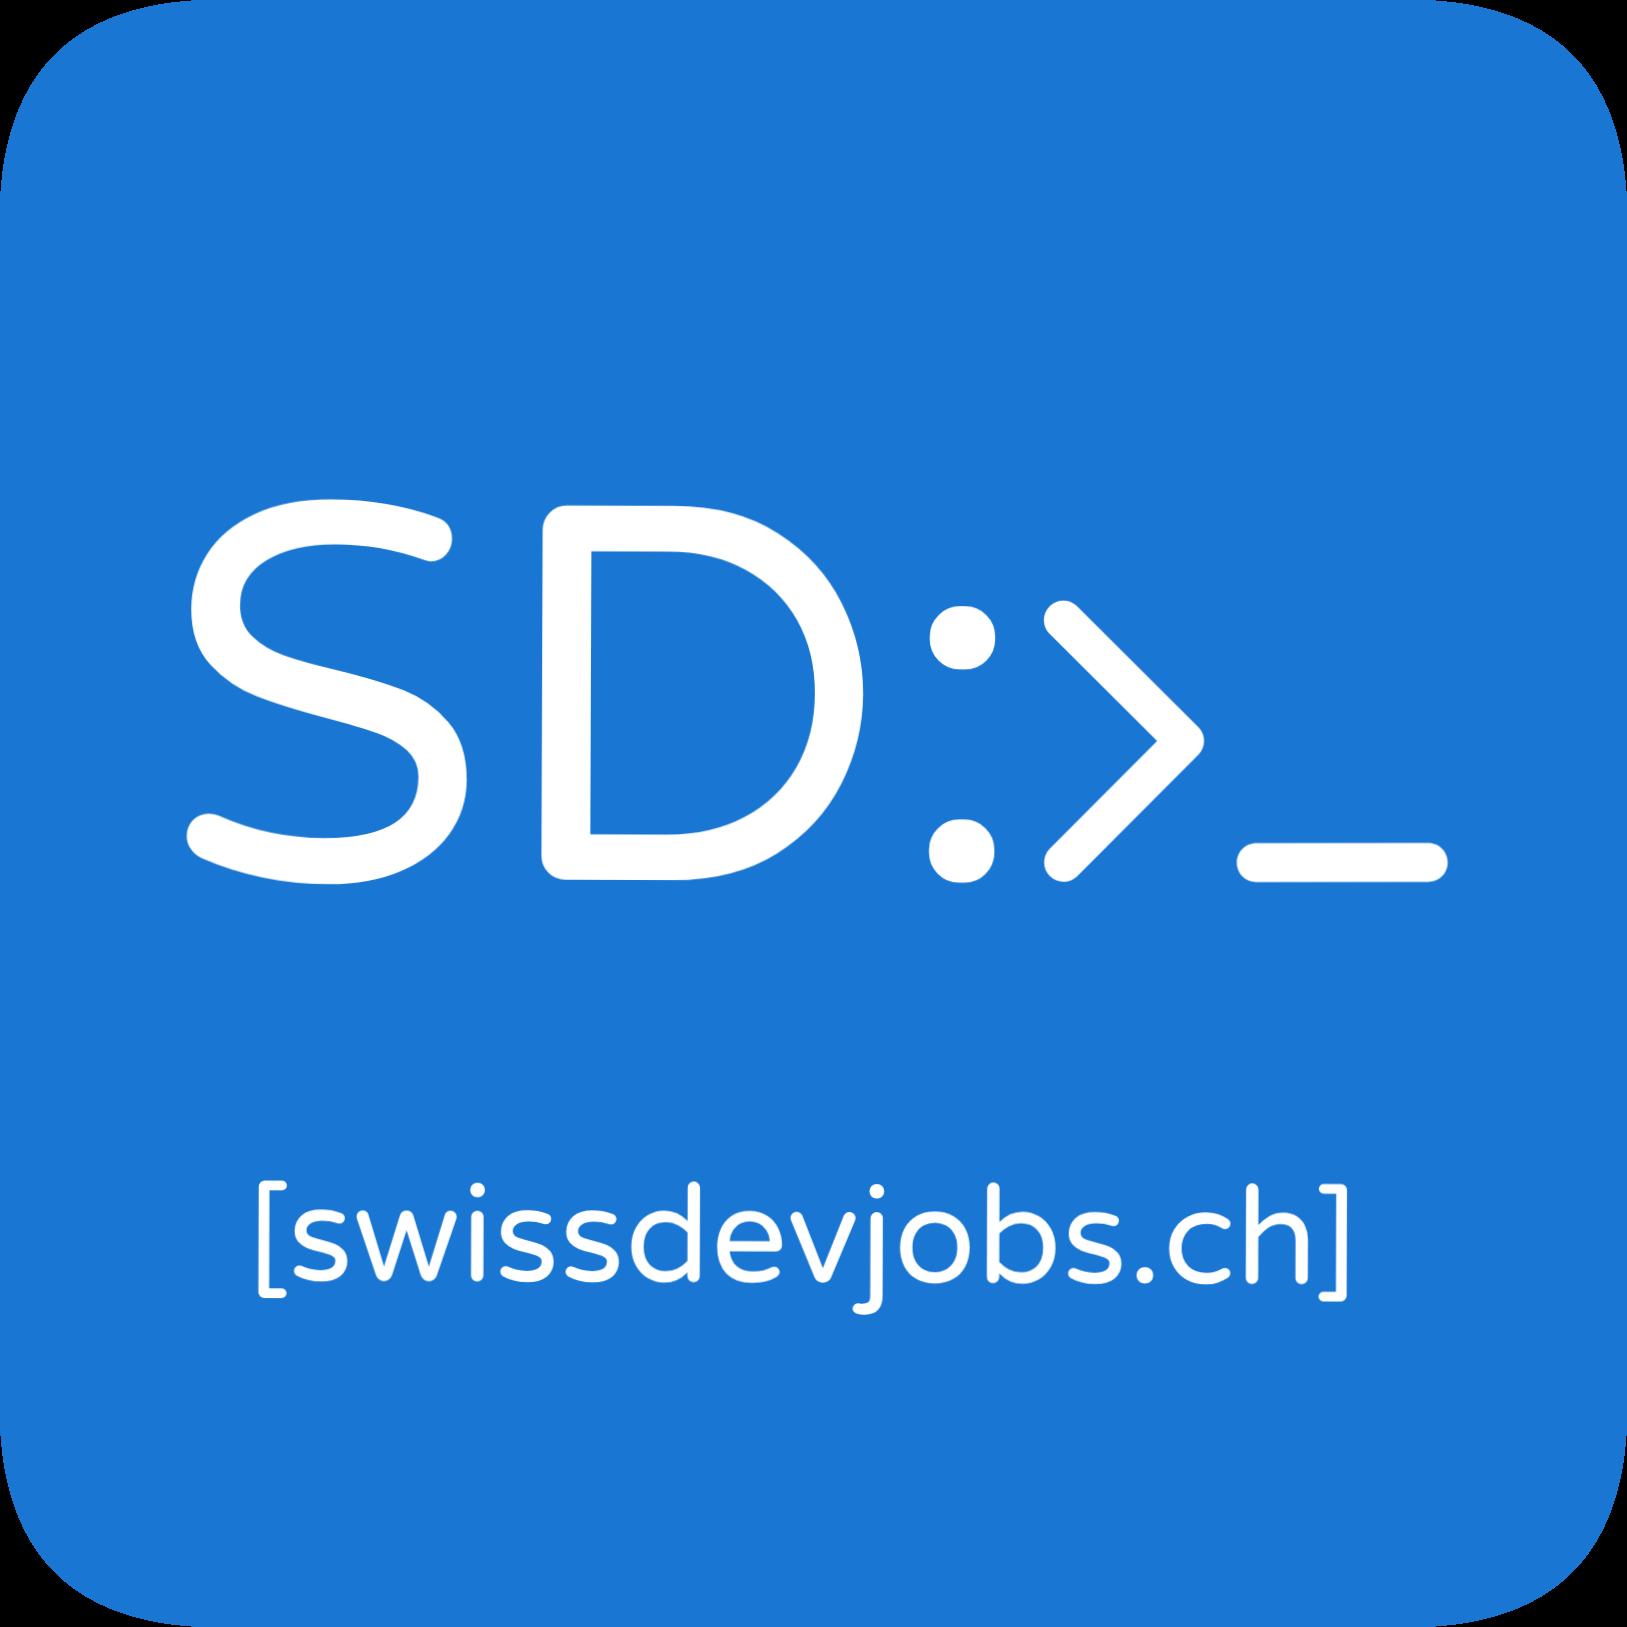 SwissDevJobs.ch